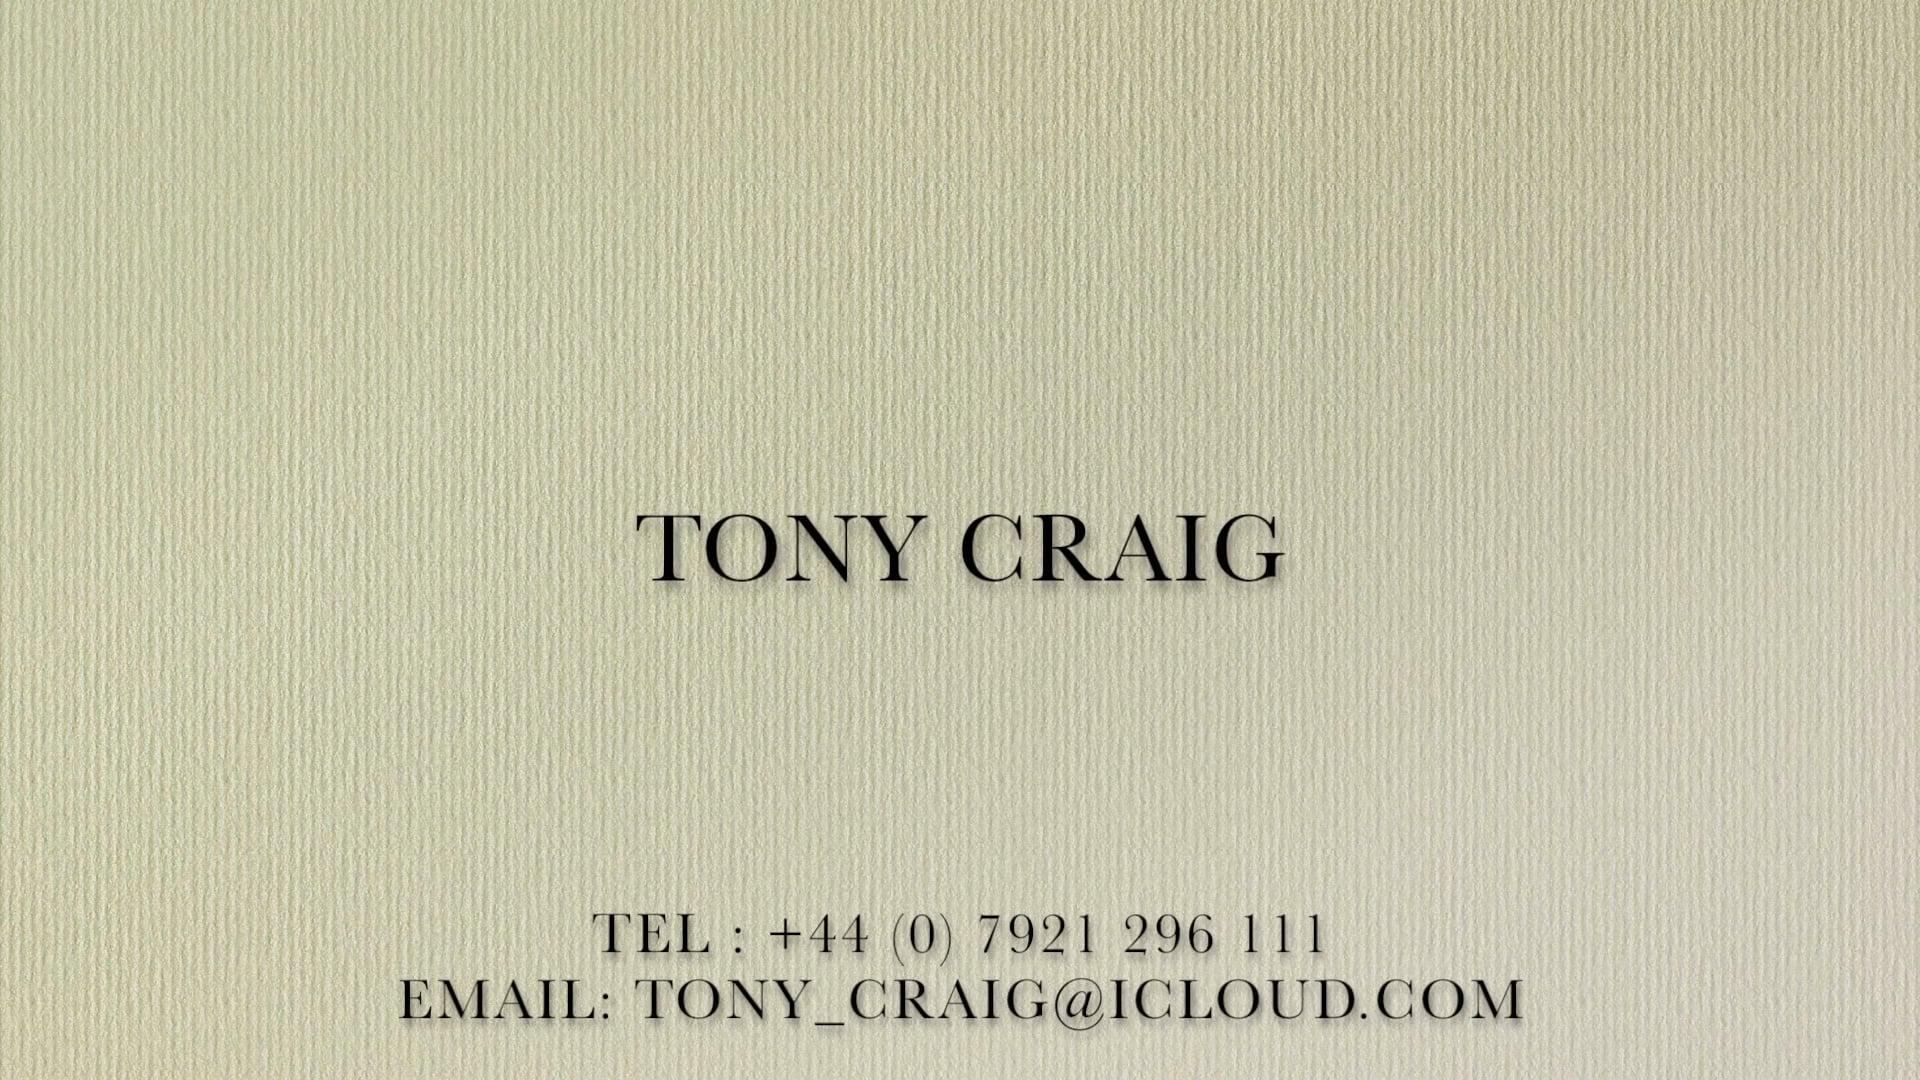 Tony Craig Reel 2018 - Extended Version